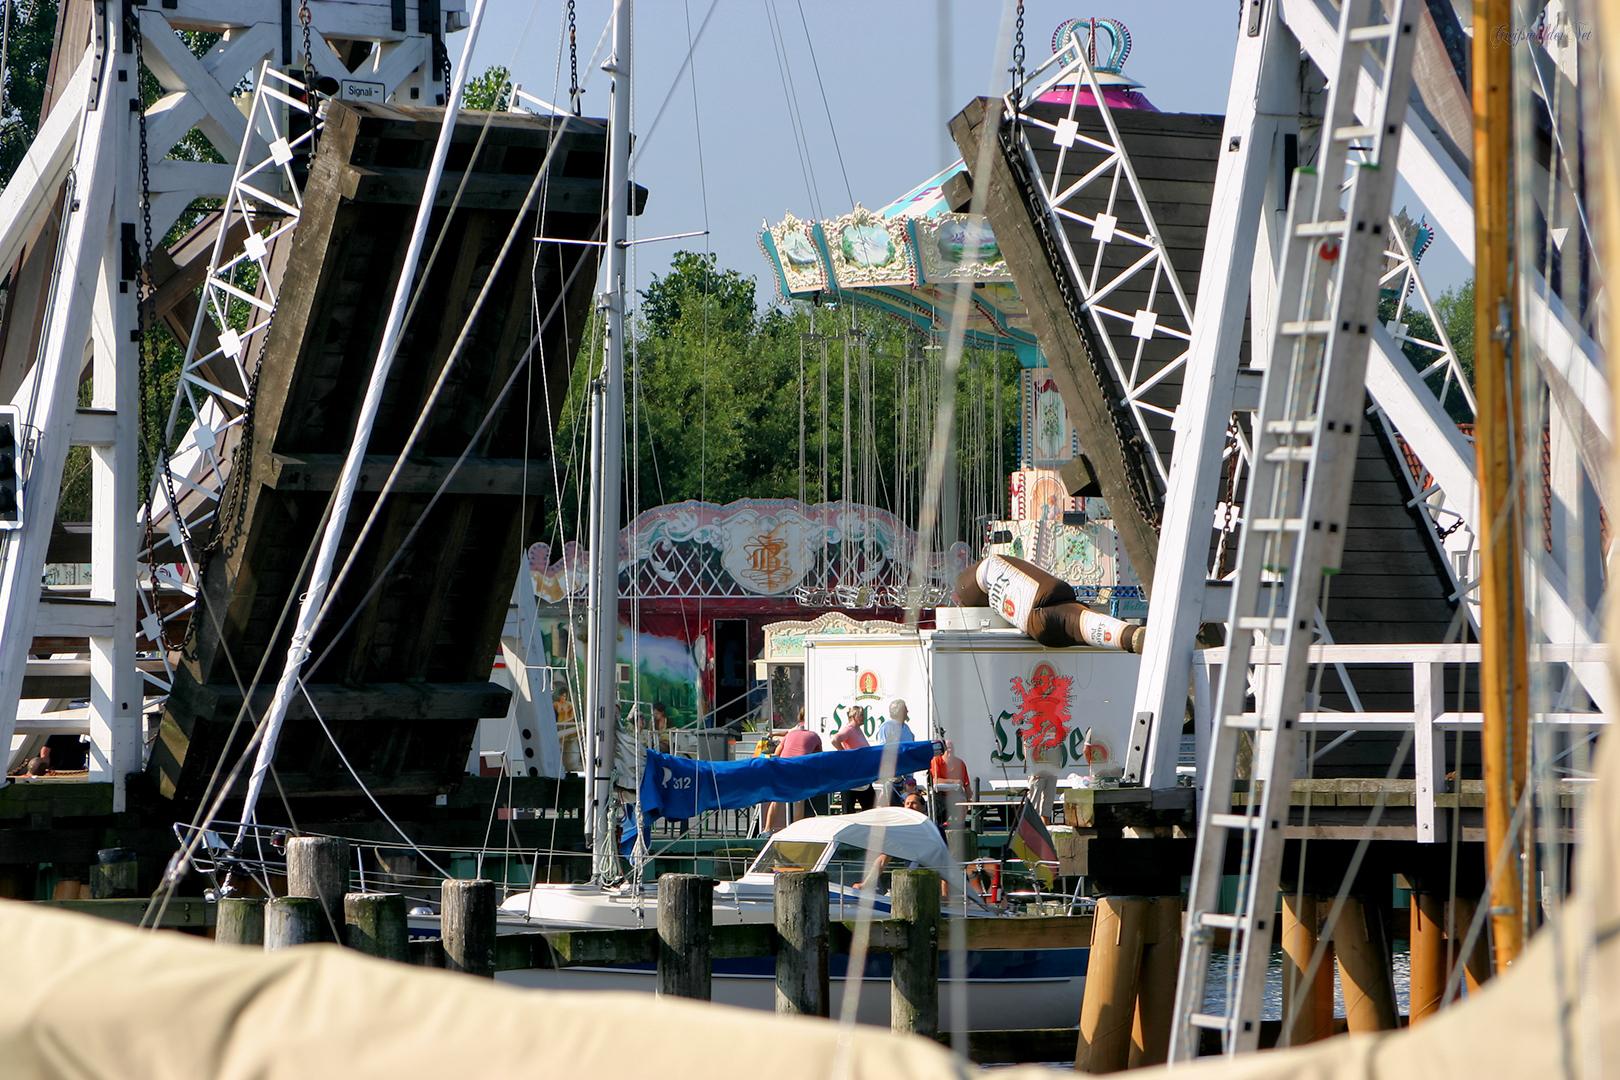 Fischerfest Gaffelrigg in Greifswald-Wieck, Holzklappbrücke - Juli 2007